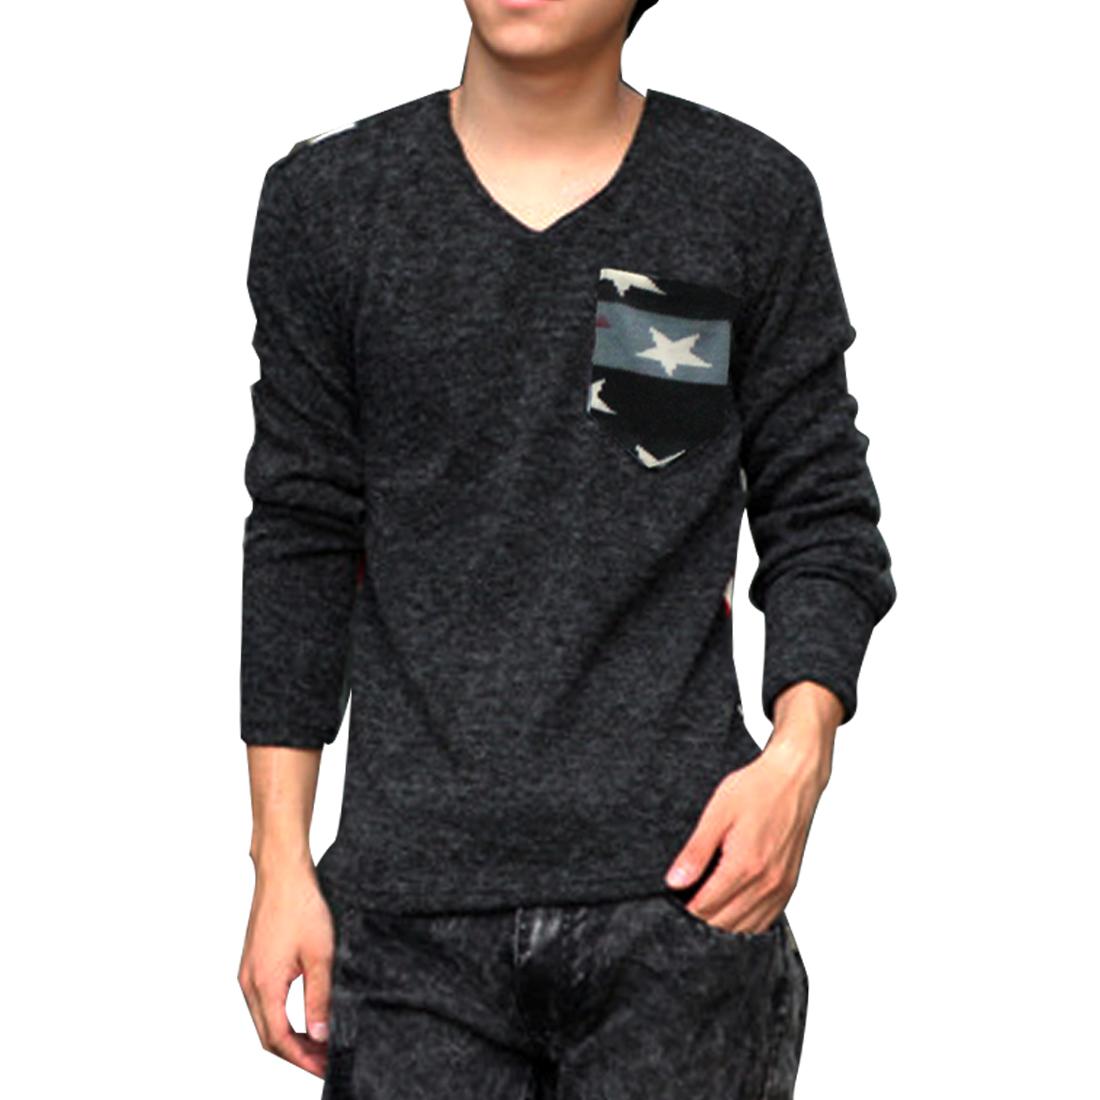 Men Dark Gray Stripes Pattern Back Stretchy Fashion Sweater M